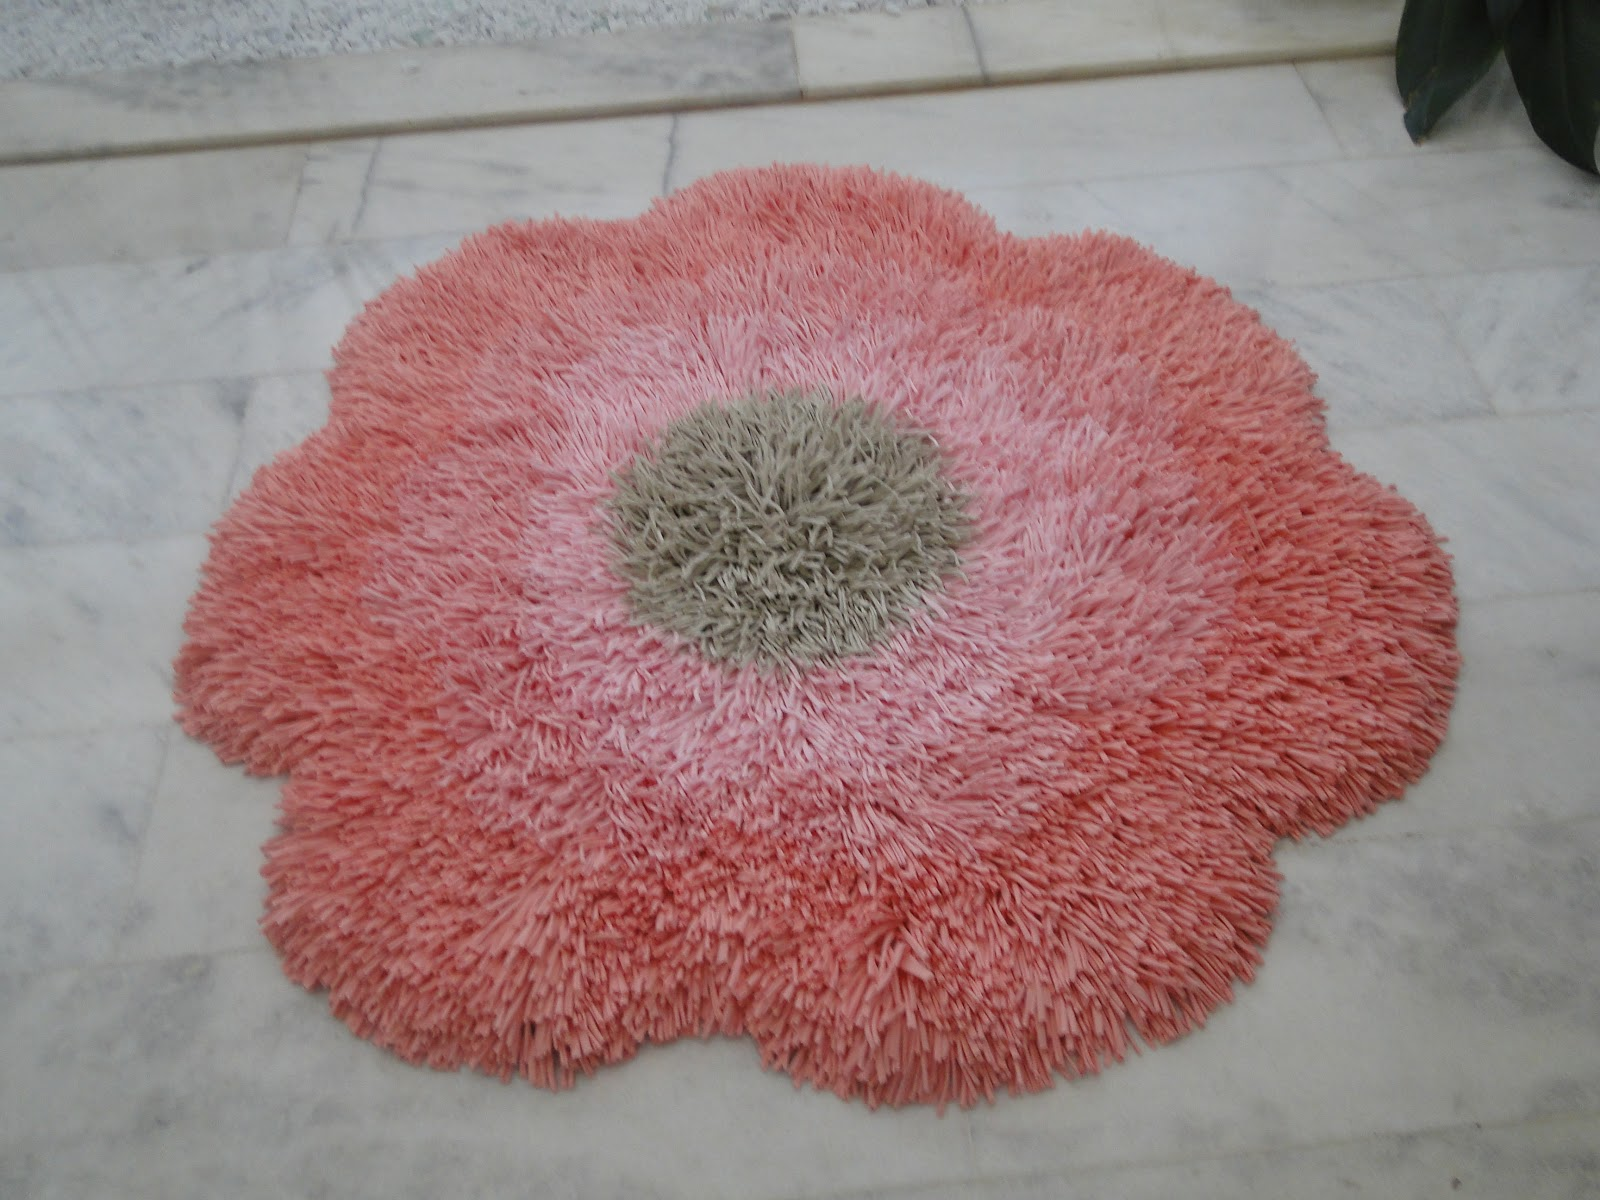 studio vanilla baby tapete rosa e marron bege quarto menina. Black Bedroom Furniture Sets. Home Design Ideas